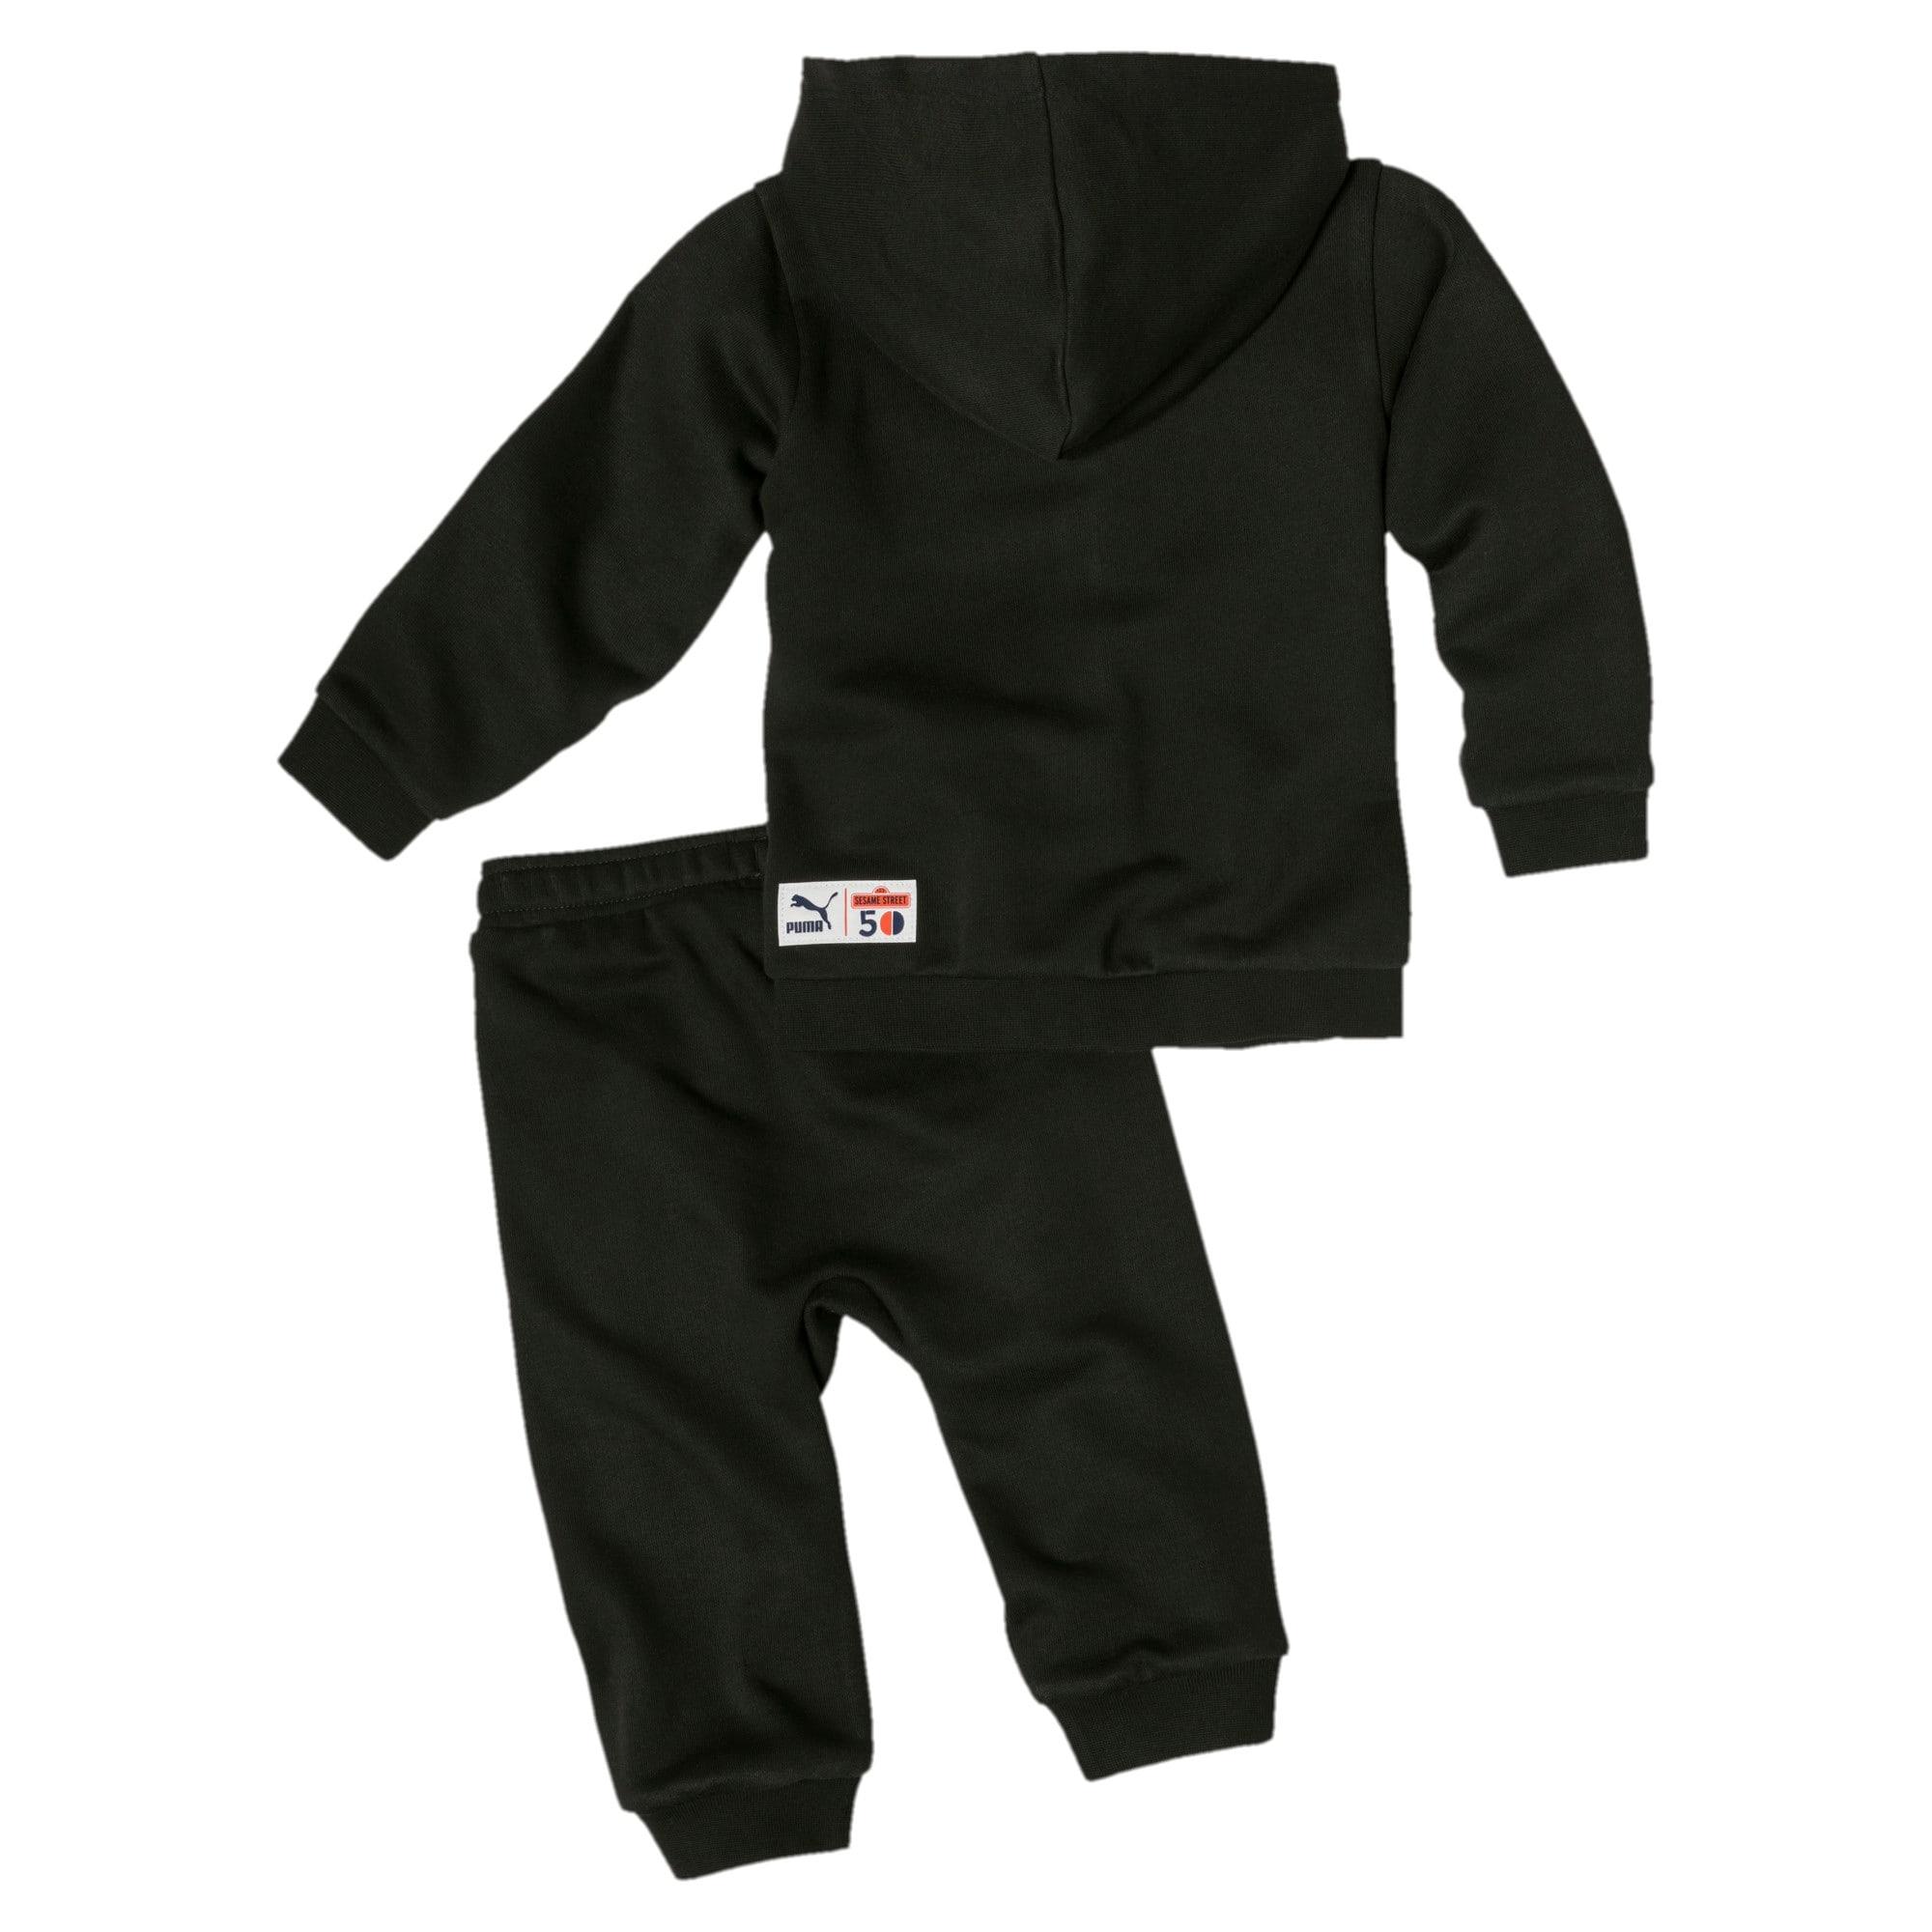 Thumbnail 2 of PUMA x SESAME STREET Infant + Toddler Sweatsuit Set, Cotton Black, medium